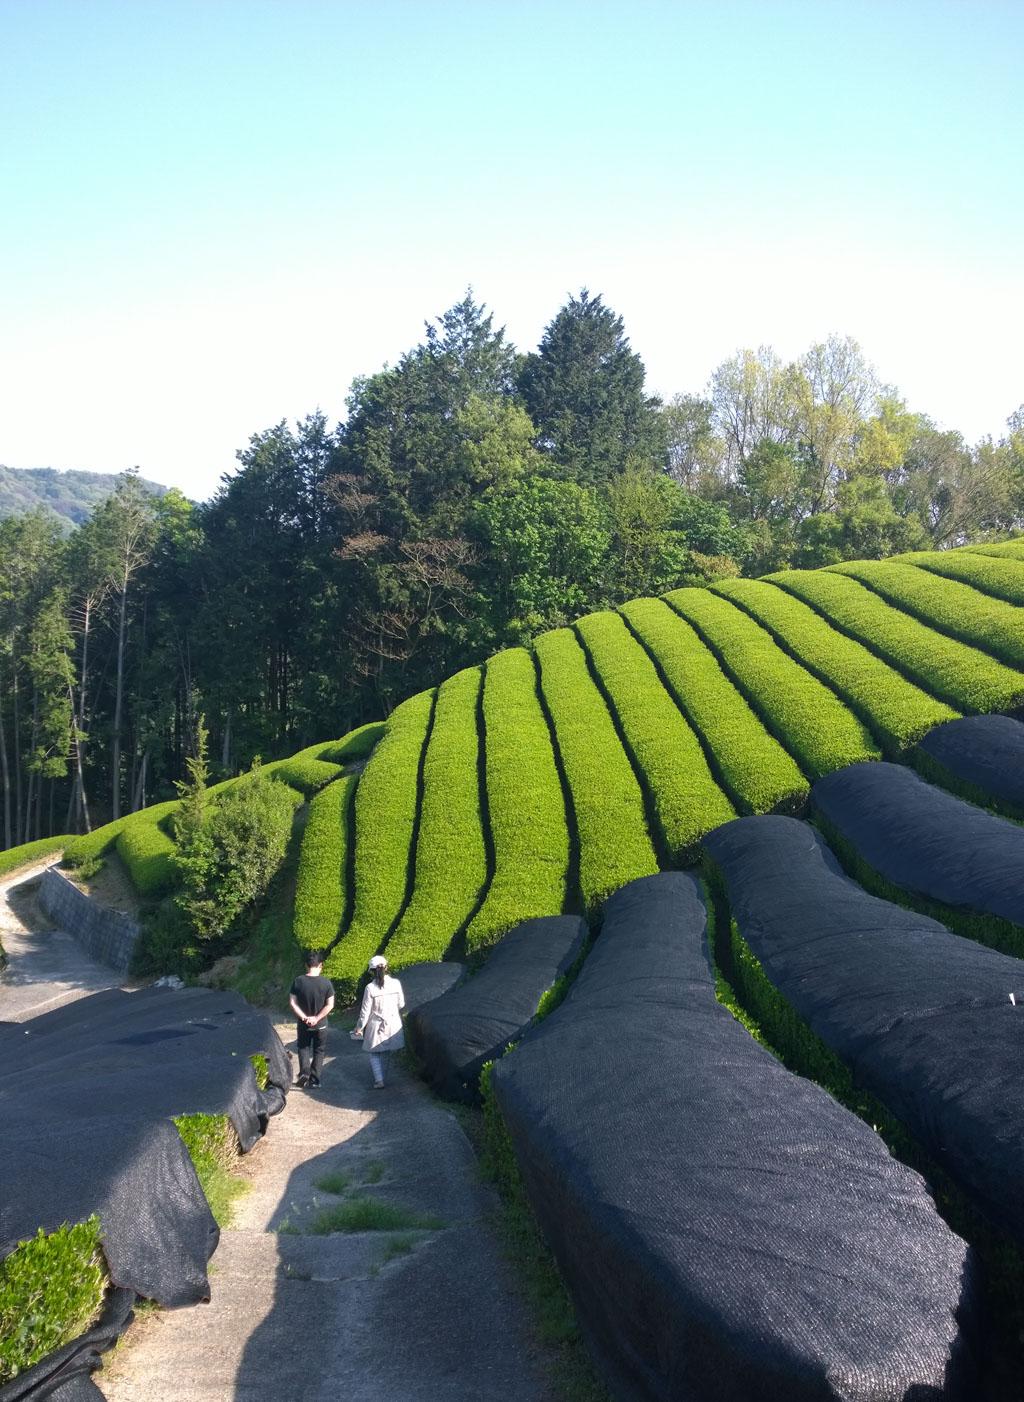 Lalani & Co London: Matcha tea garden Japan